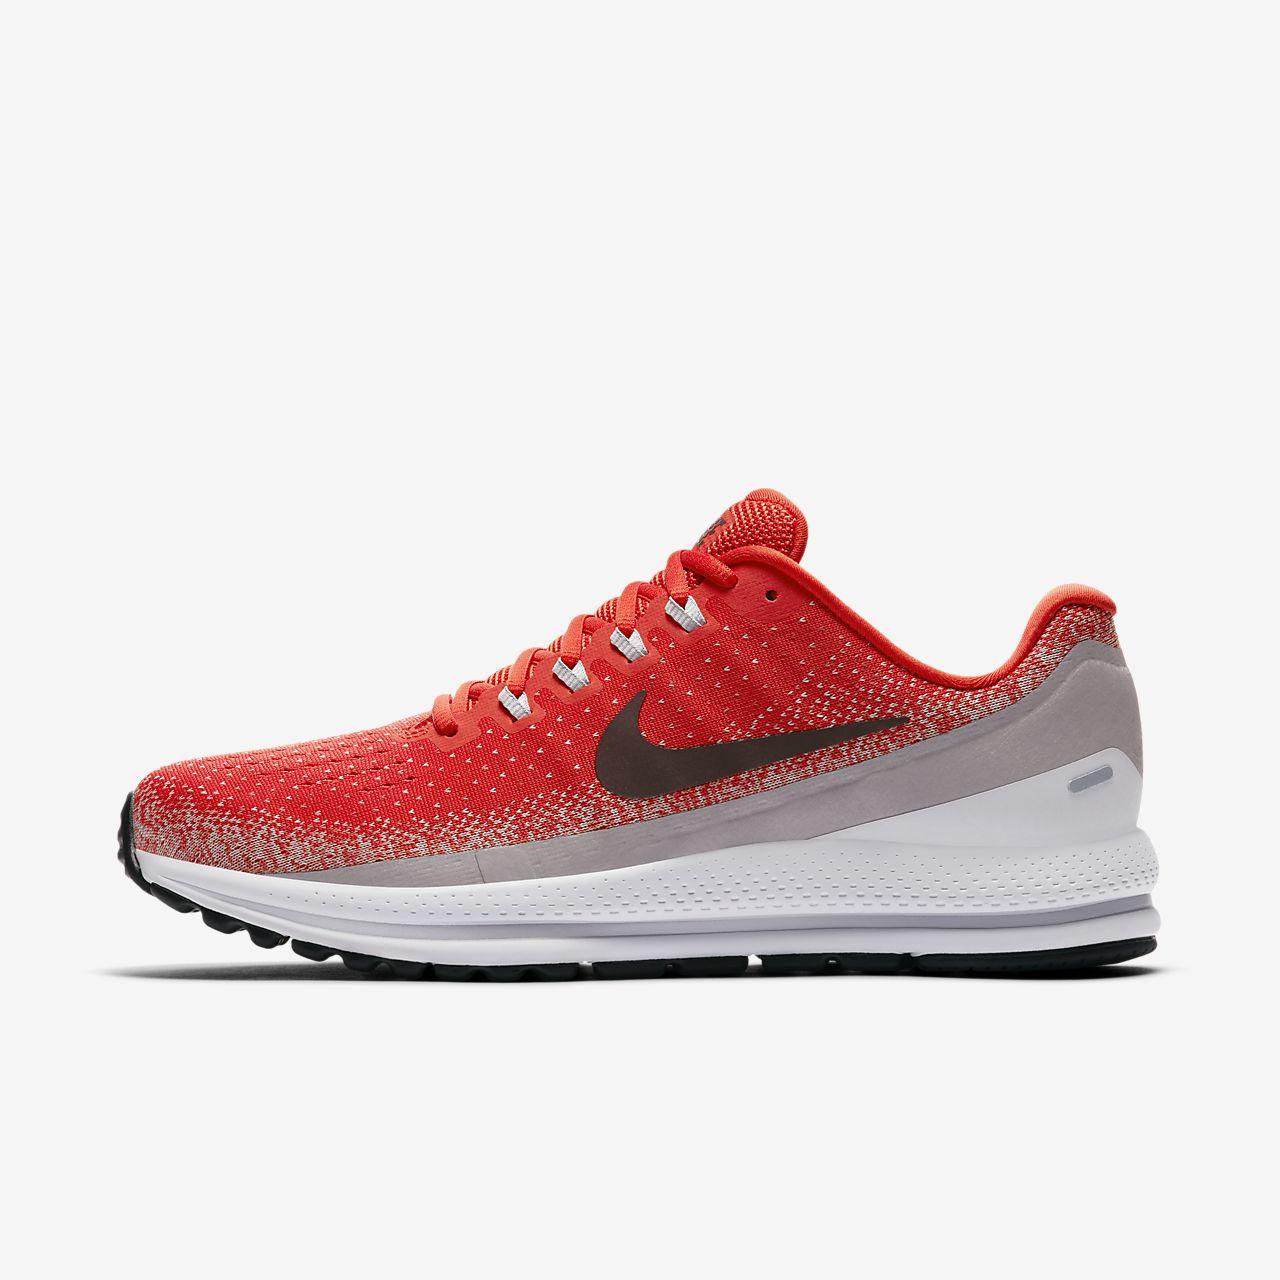 Nike AIR ZOOM VOMERO 13 Nike 2018 Uomo Para Pre Salida Tarifa Barata De Envío Bajo Oficial Barato oPMHU14